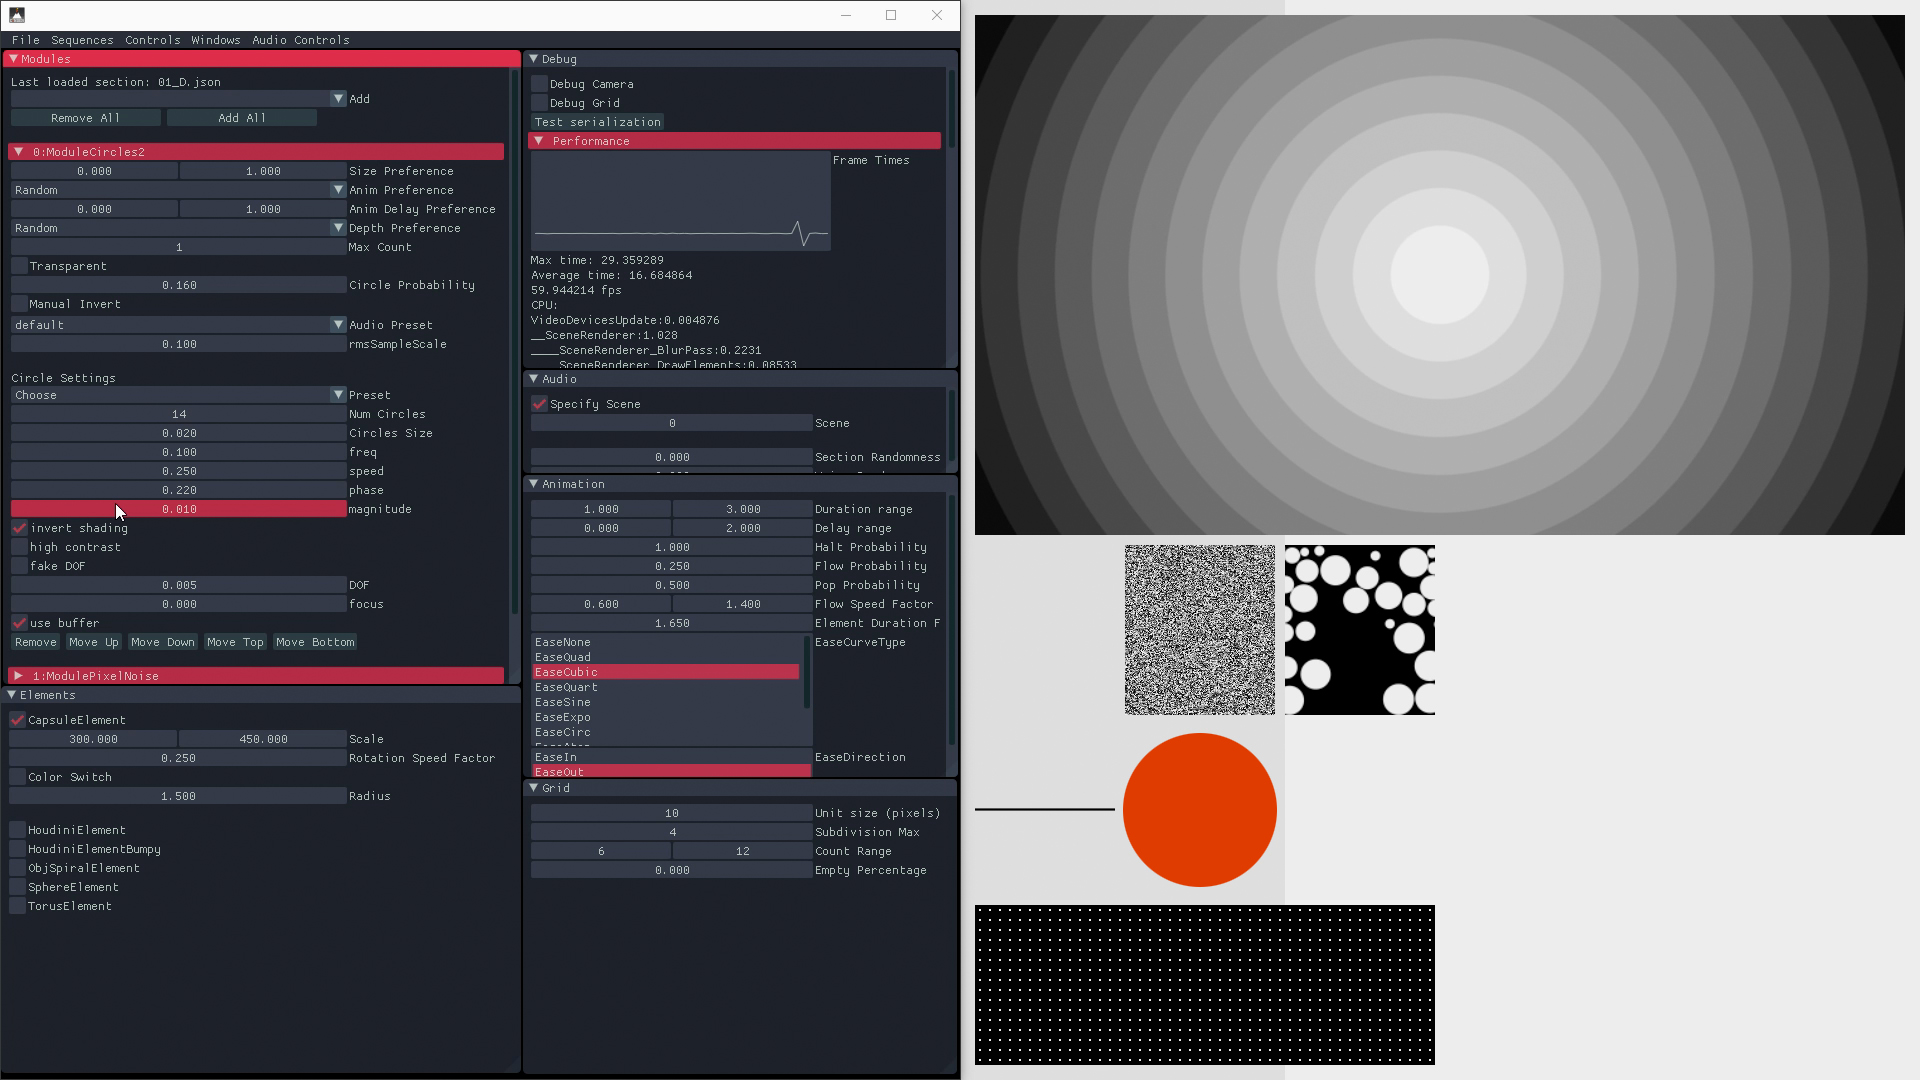 AICP_System_01.jpg